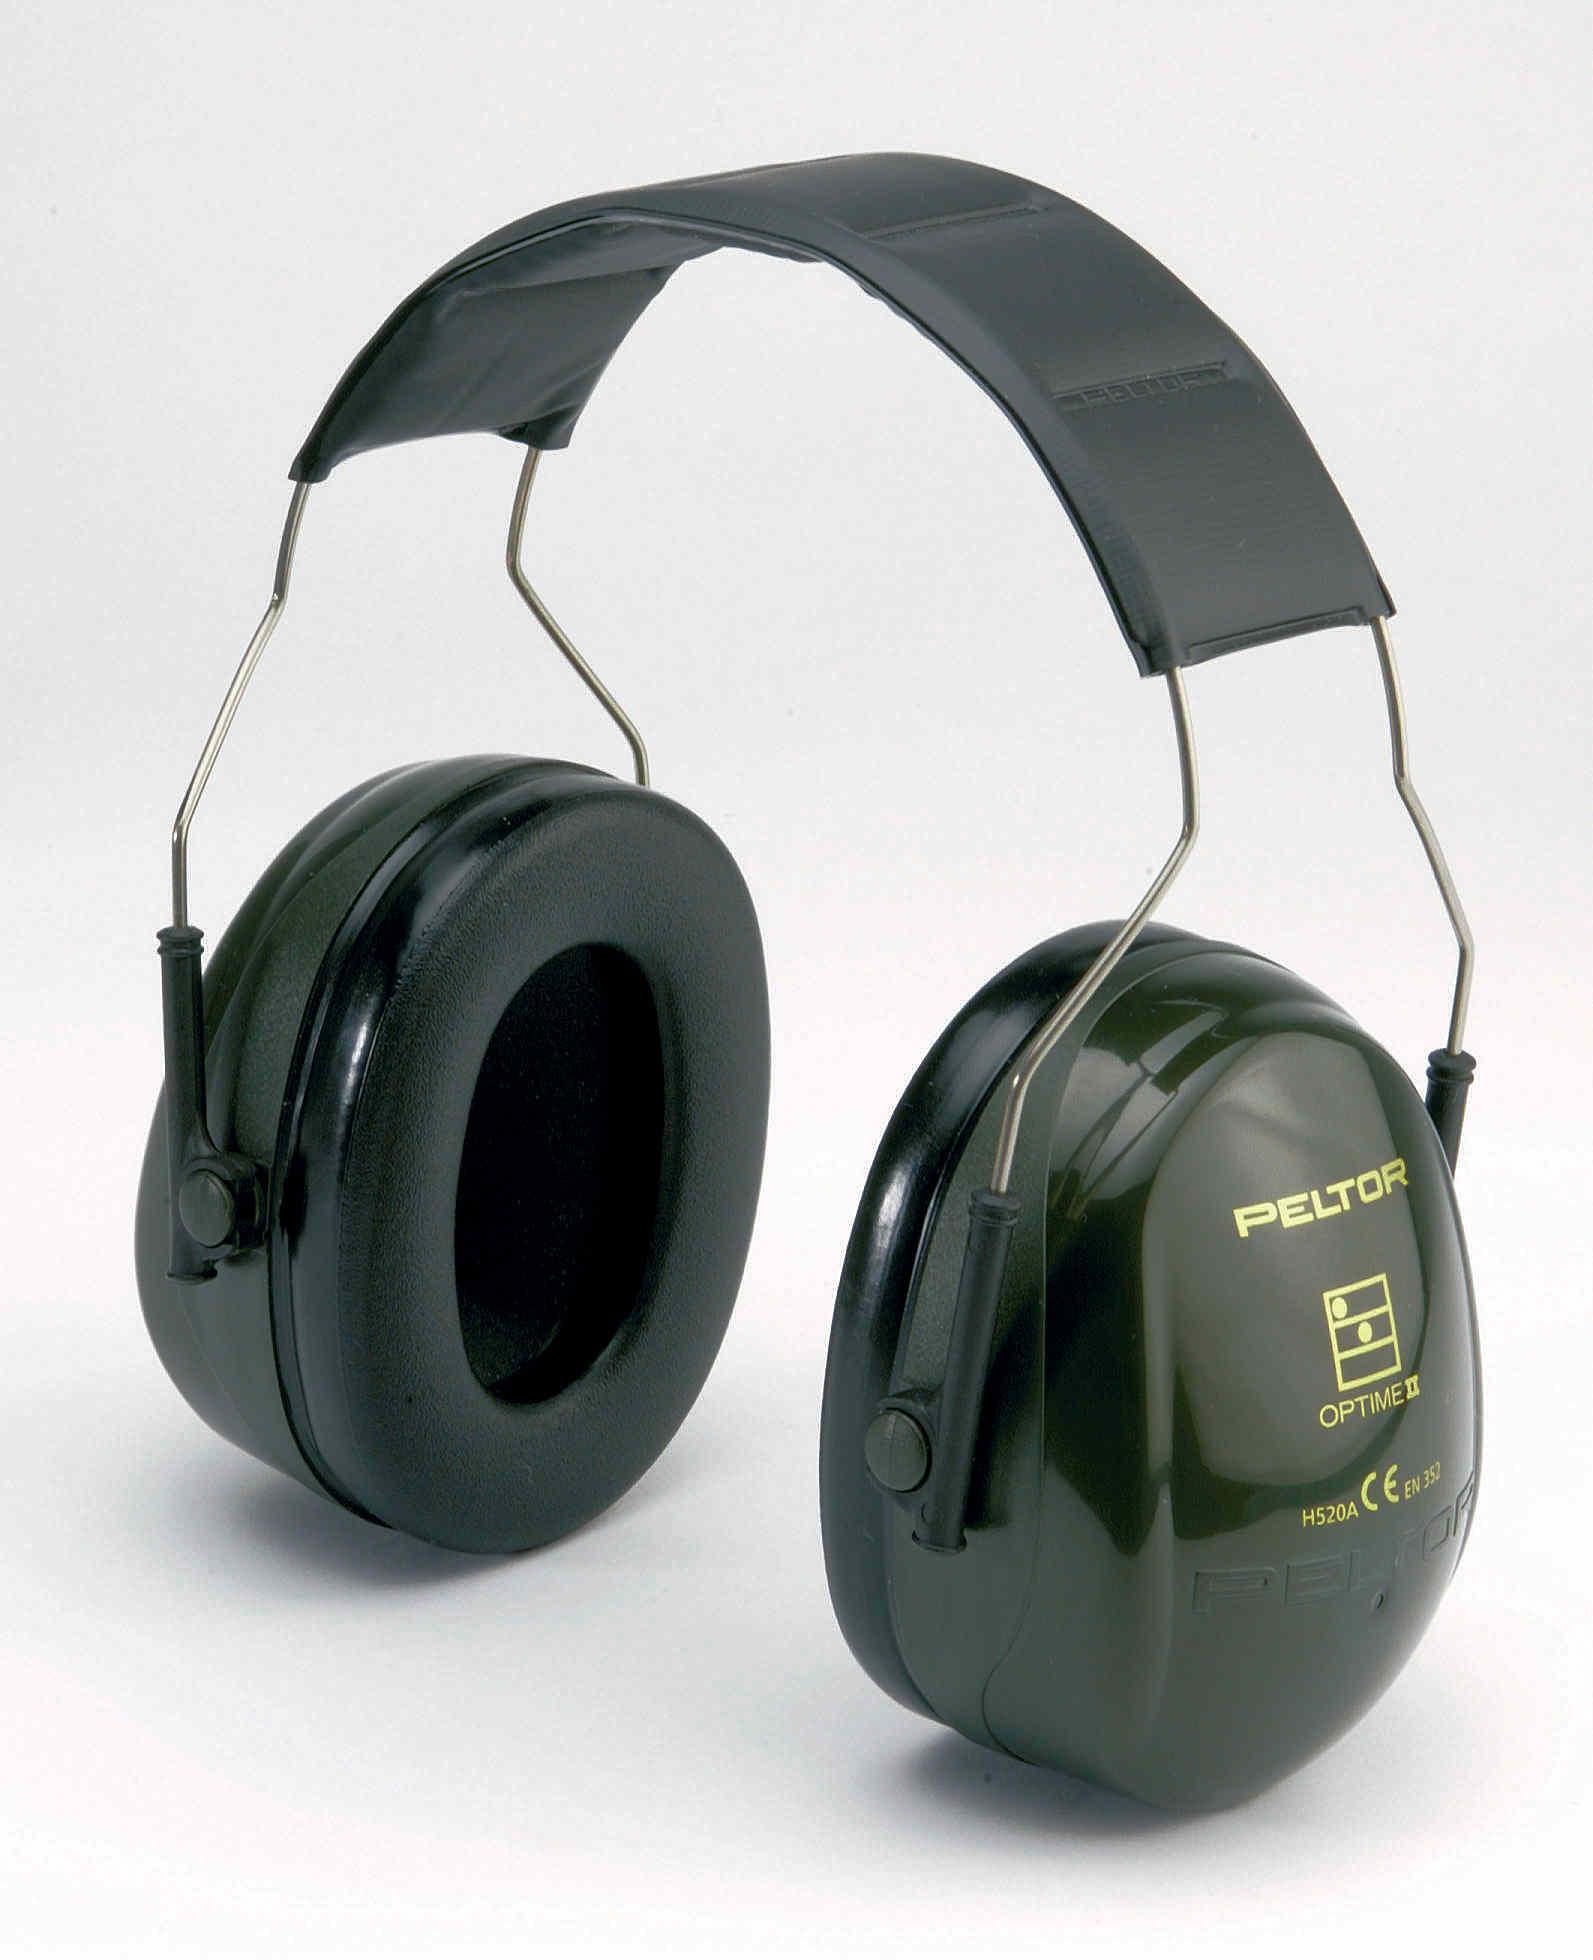 craig international ear defenders peltor optime ii h520a. Black Bedroom Furniture Sets. Home Design Ideas